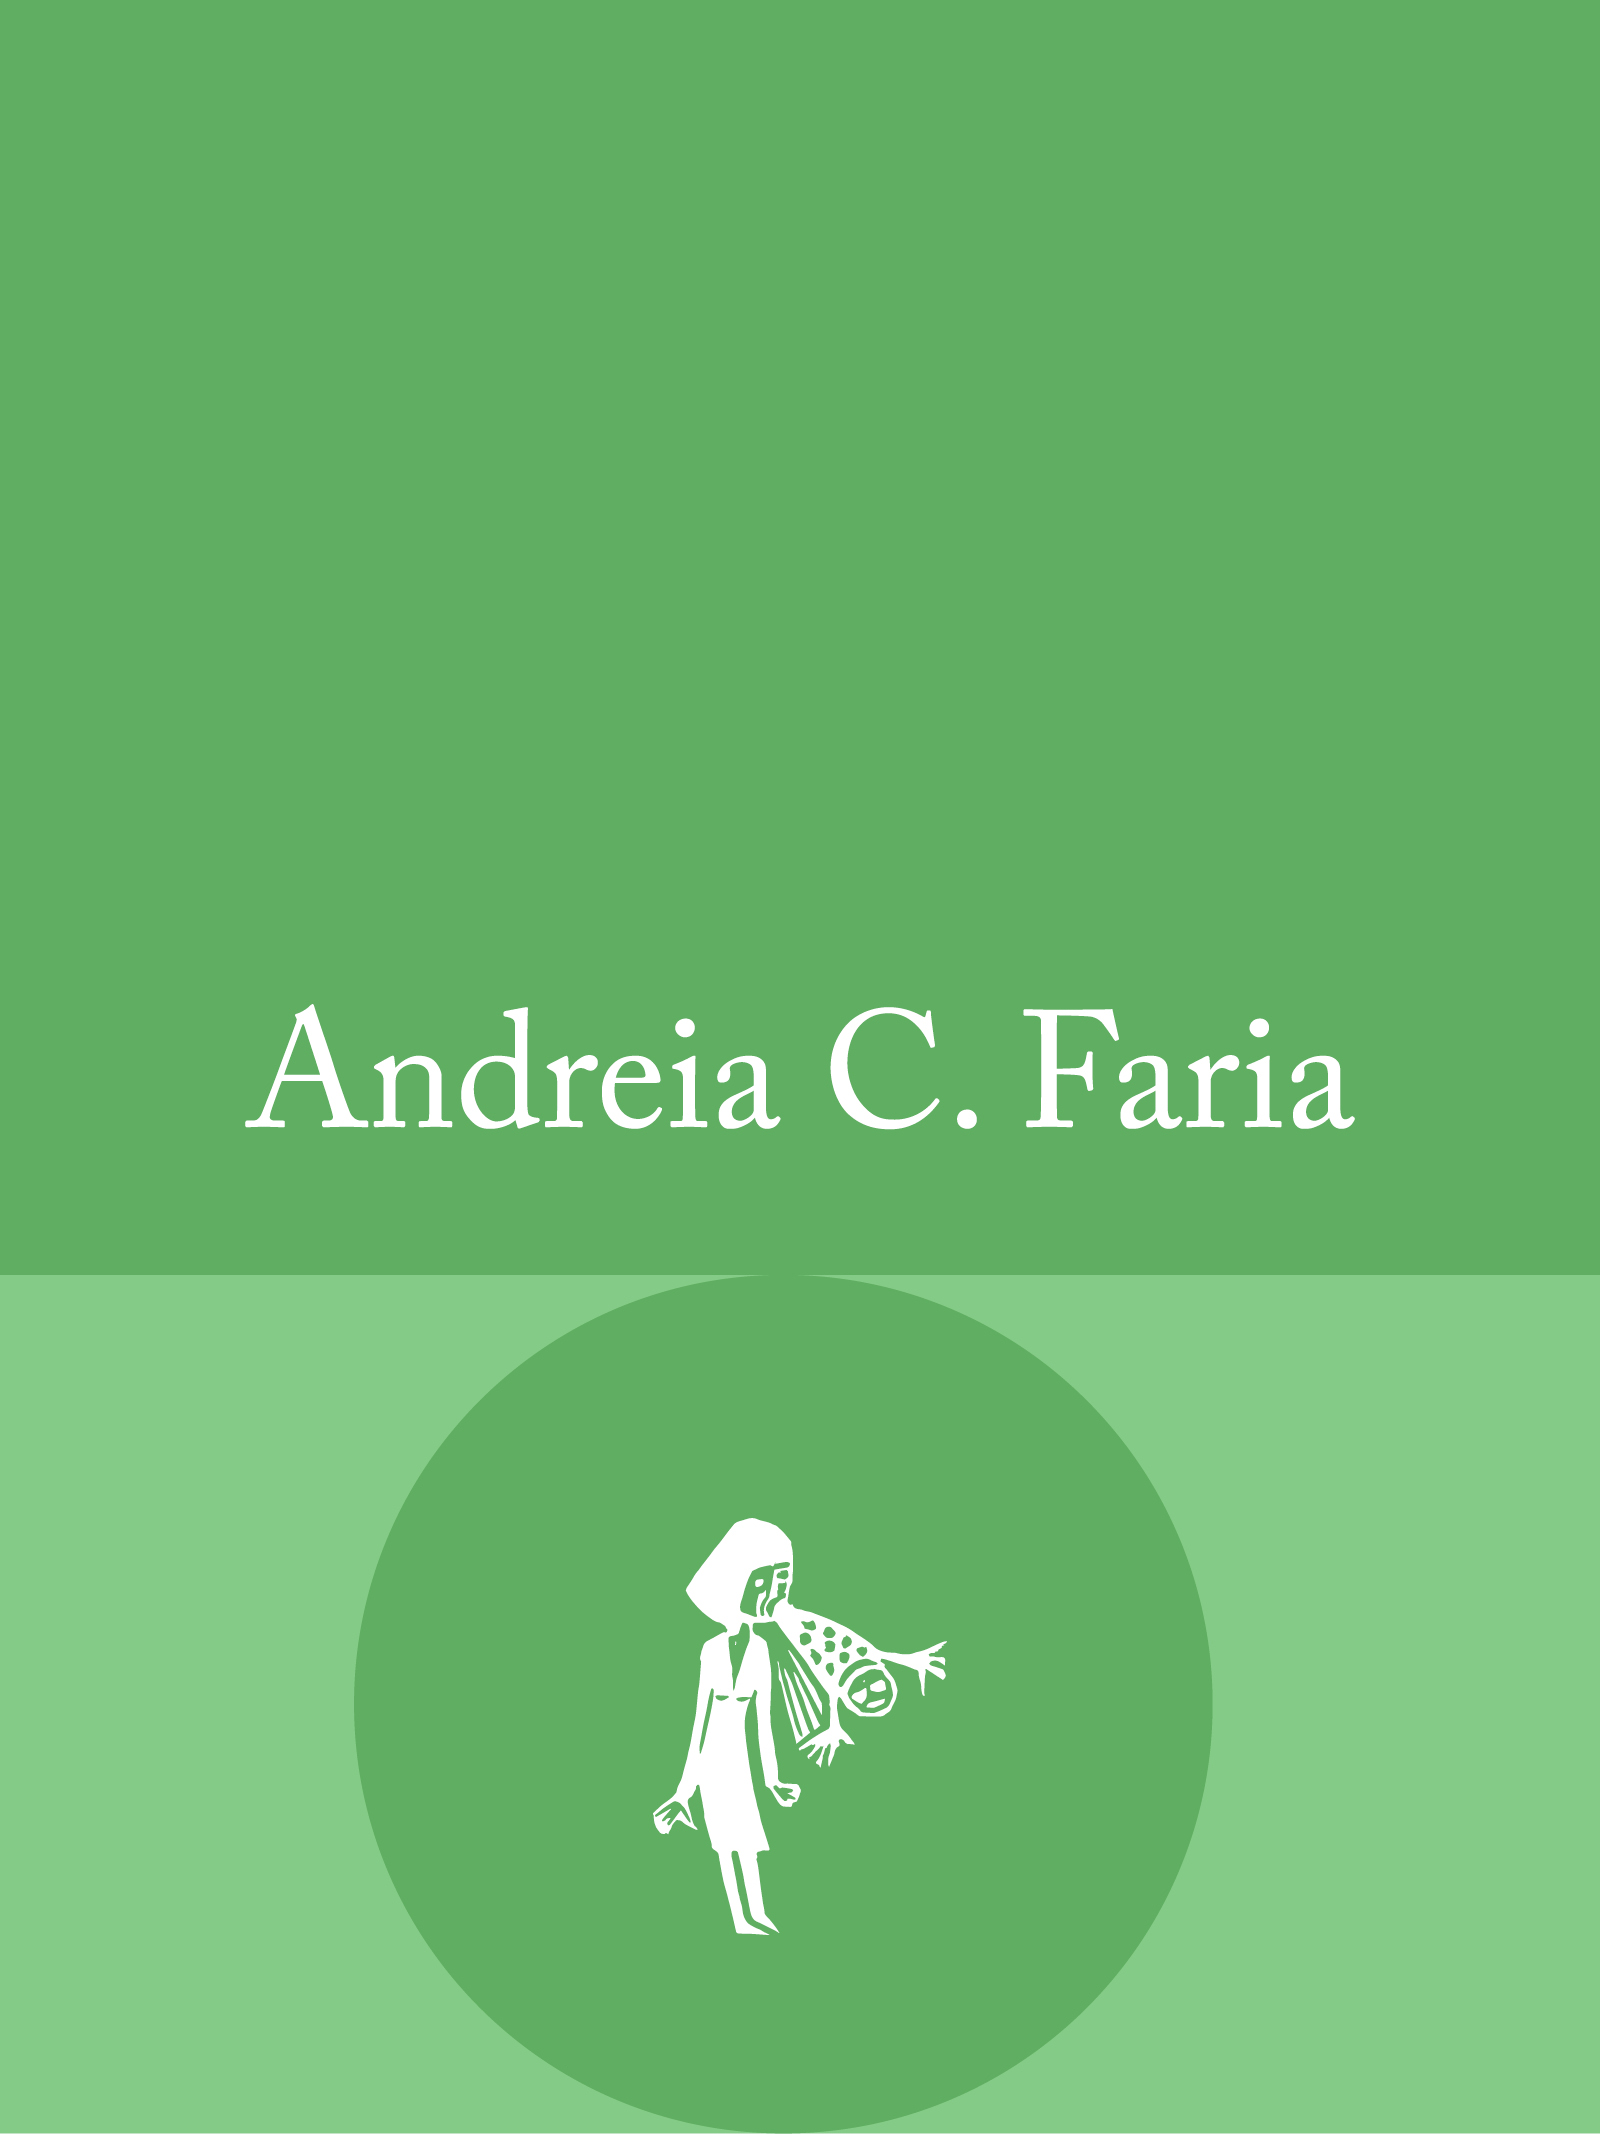 AndreiaCFaria.jpg